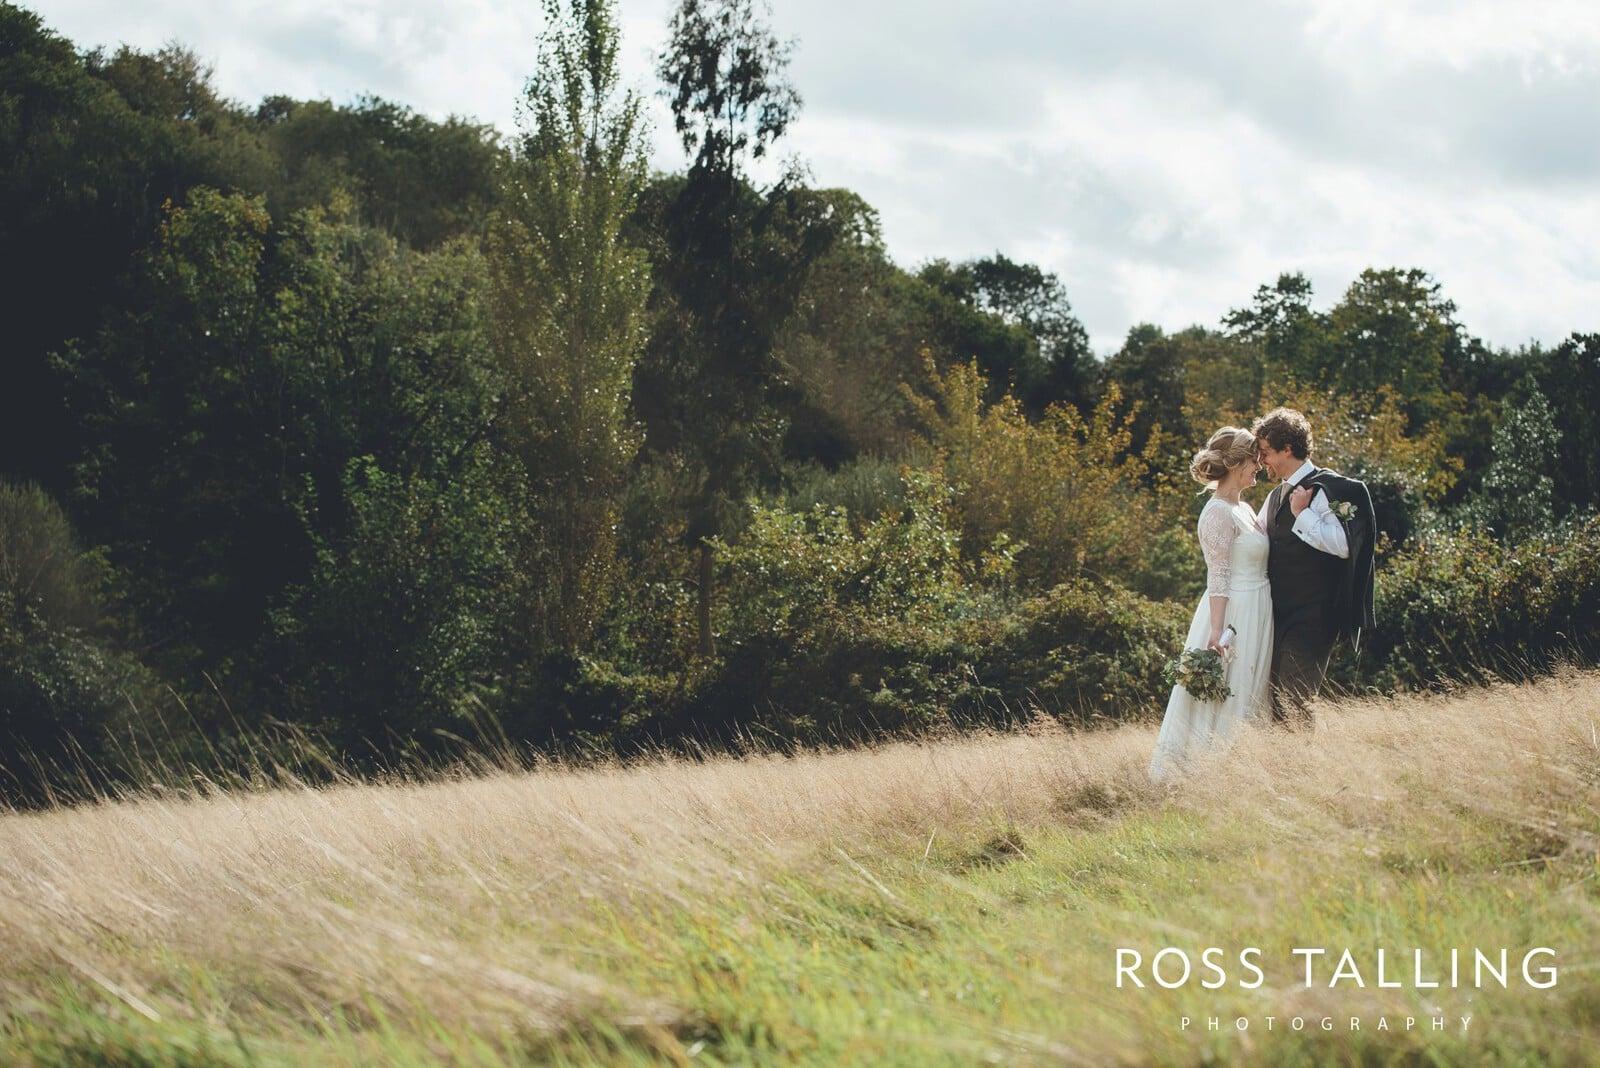 Rachel & Tom's Wedding Photography at The Green